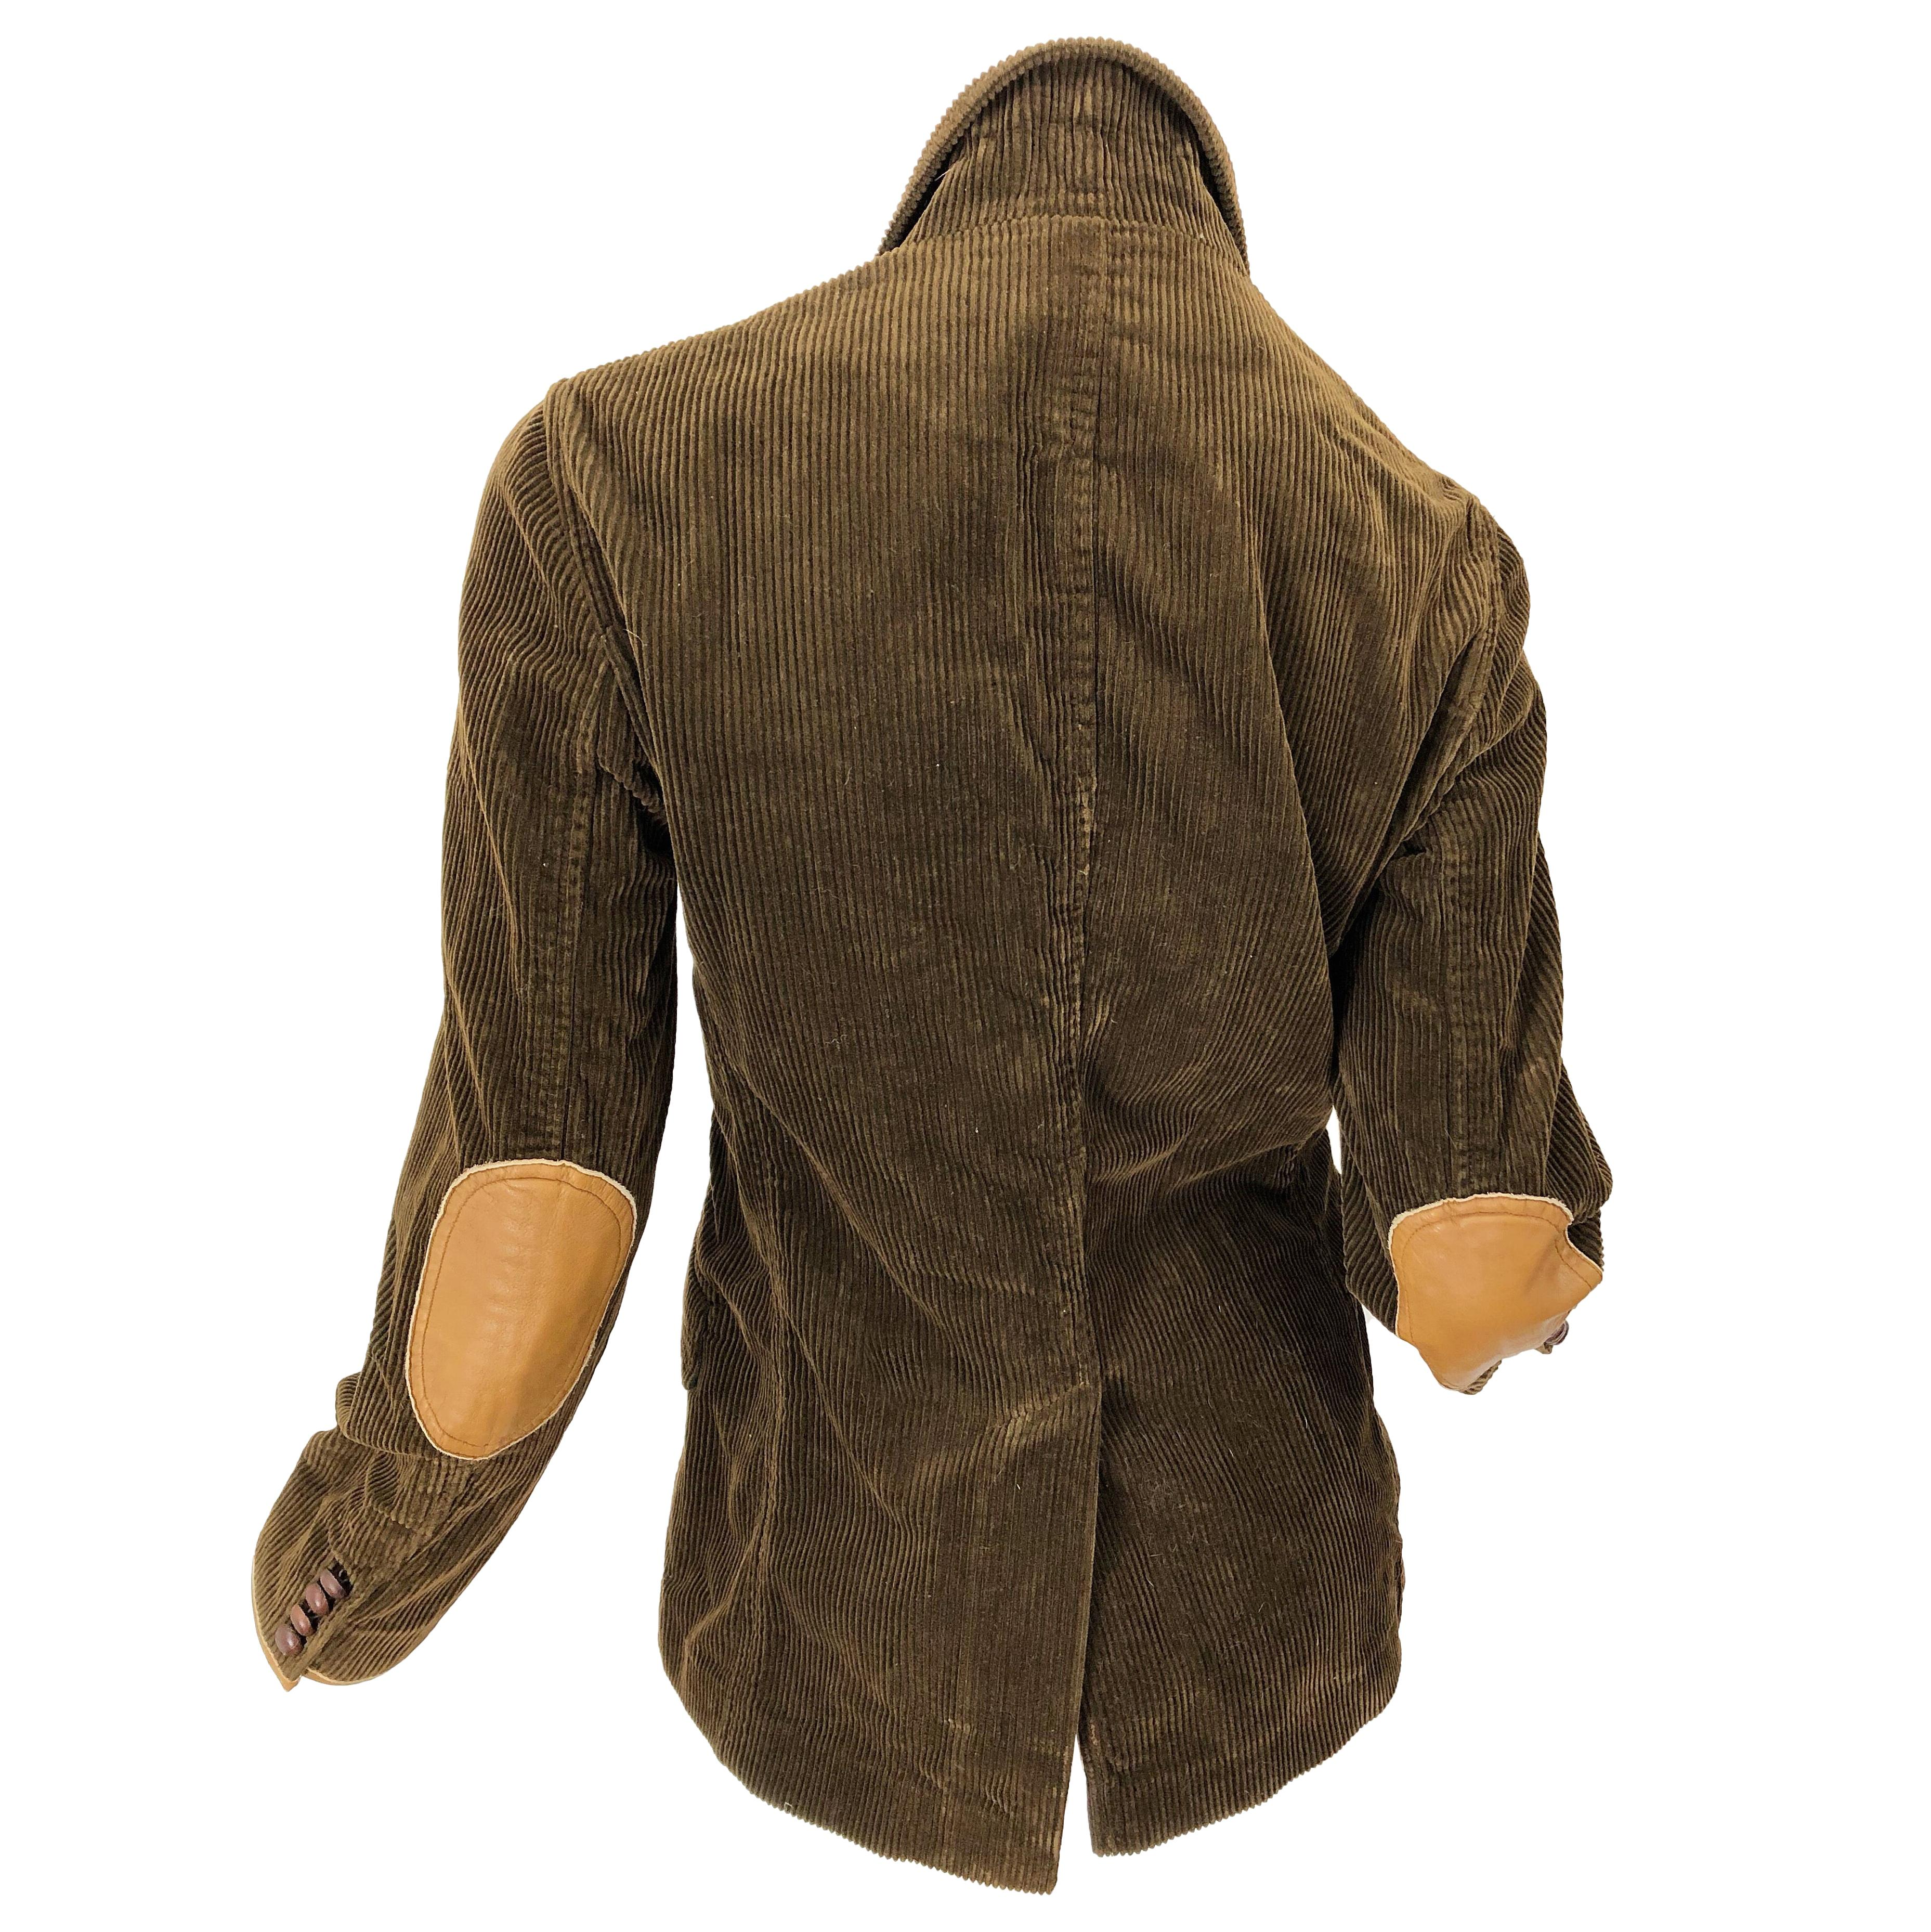 Vintage Ralph Lauren Sz 8 Brown 1990s Corduroy Leather Fitted 90s Jacket Blazer